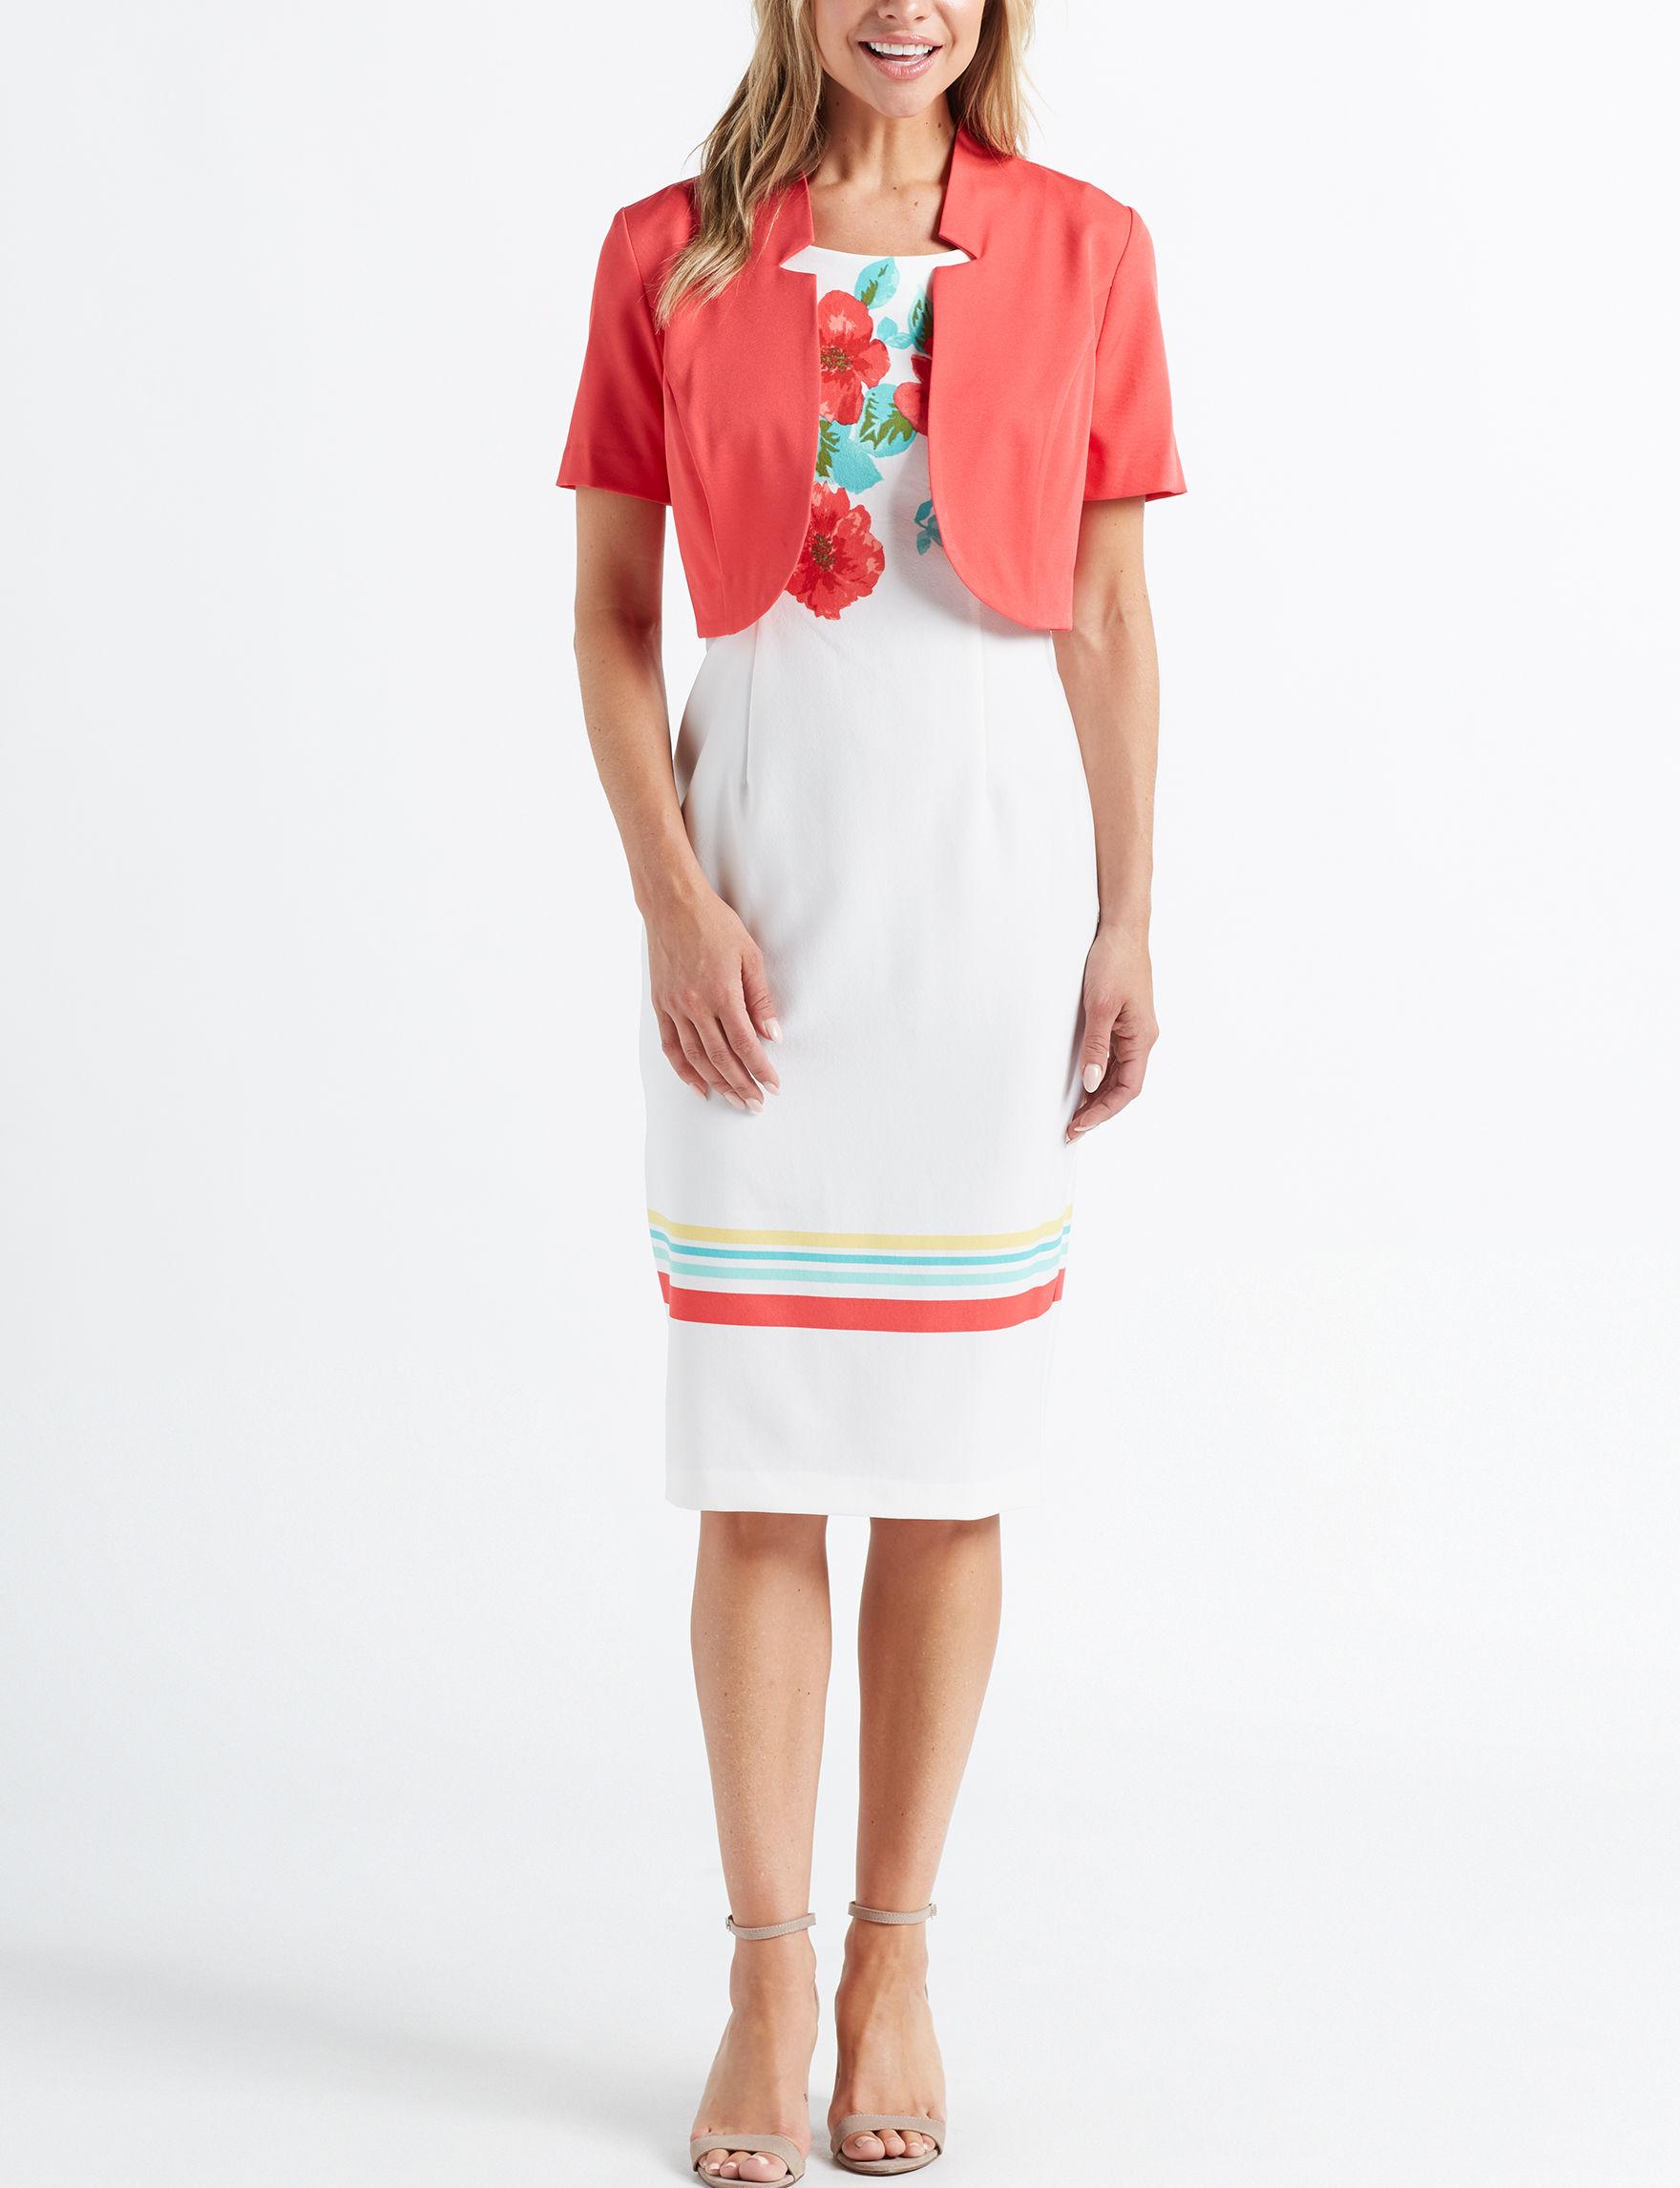 Maya Brooke Pink / White Everyday & Casual Jacket Dresses